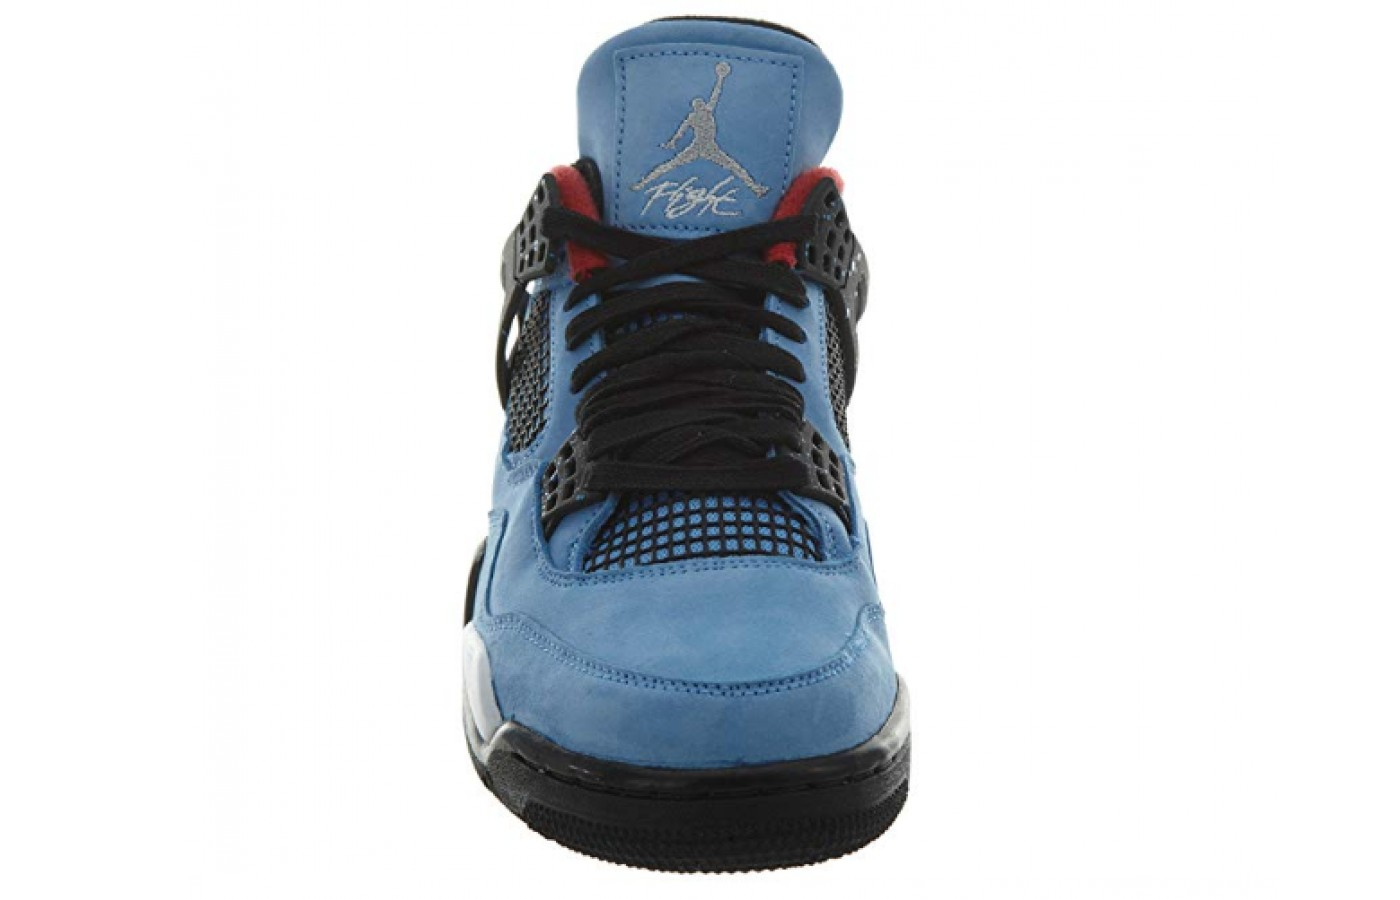 Jordan 4 Retro Travis Scott Cactus Jack Style Sneakers  front